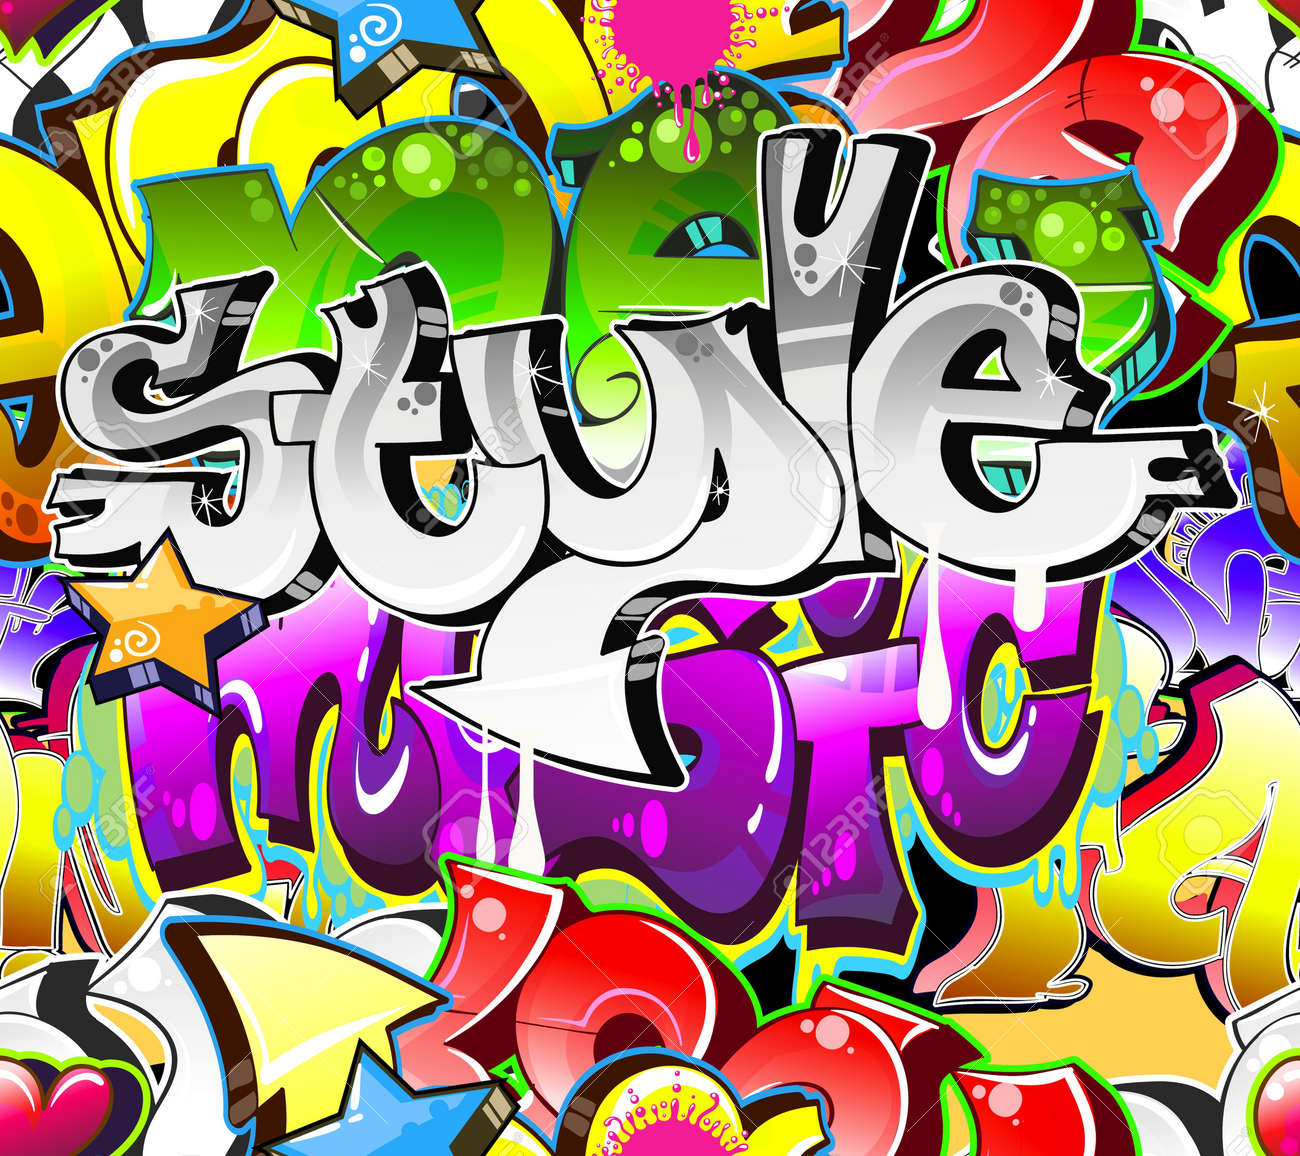 Graffiti art design - Graffiti Urban Art Background Seamless Design Stock Vector 12195957